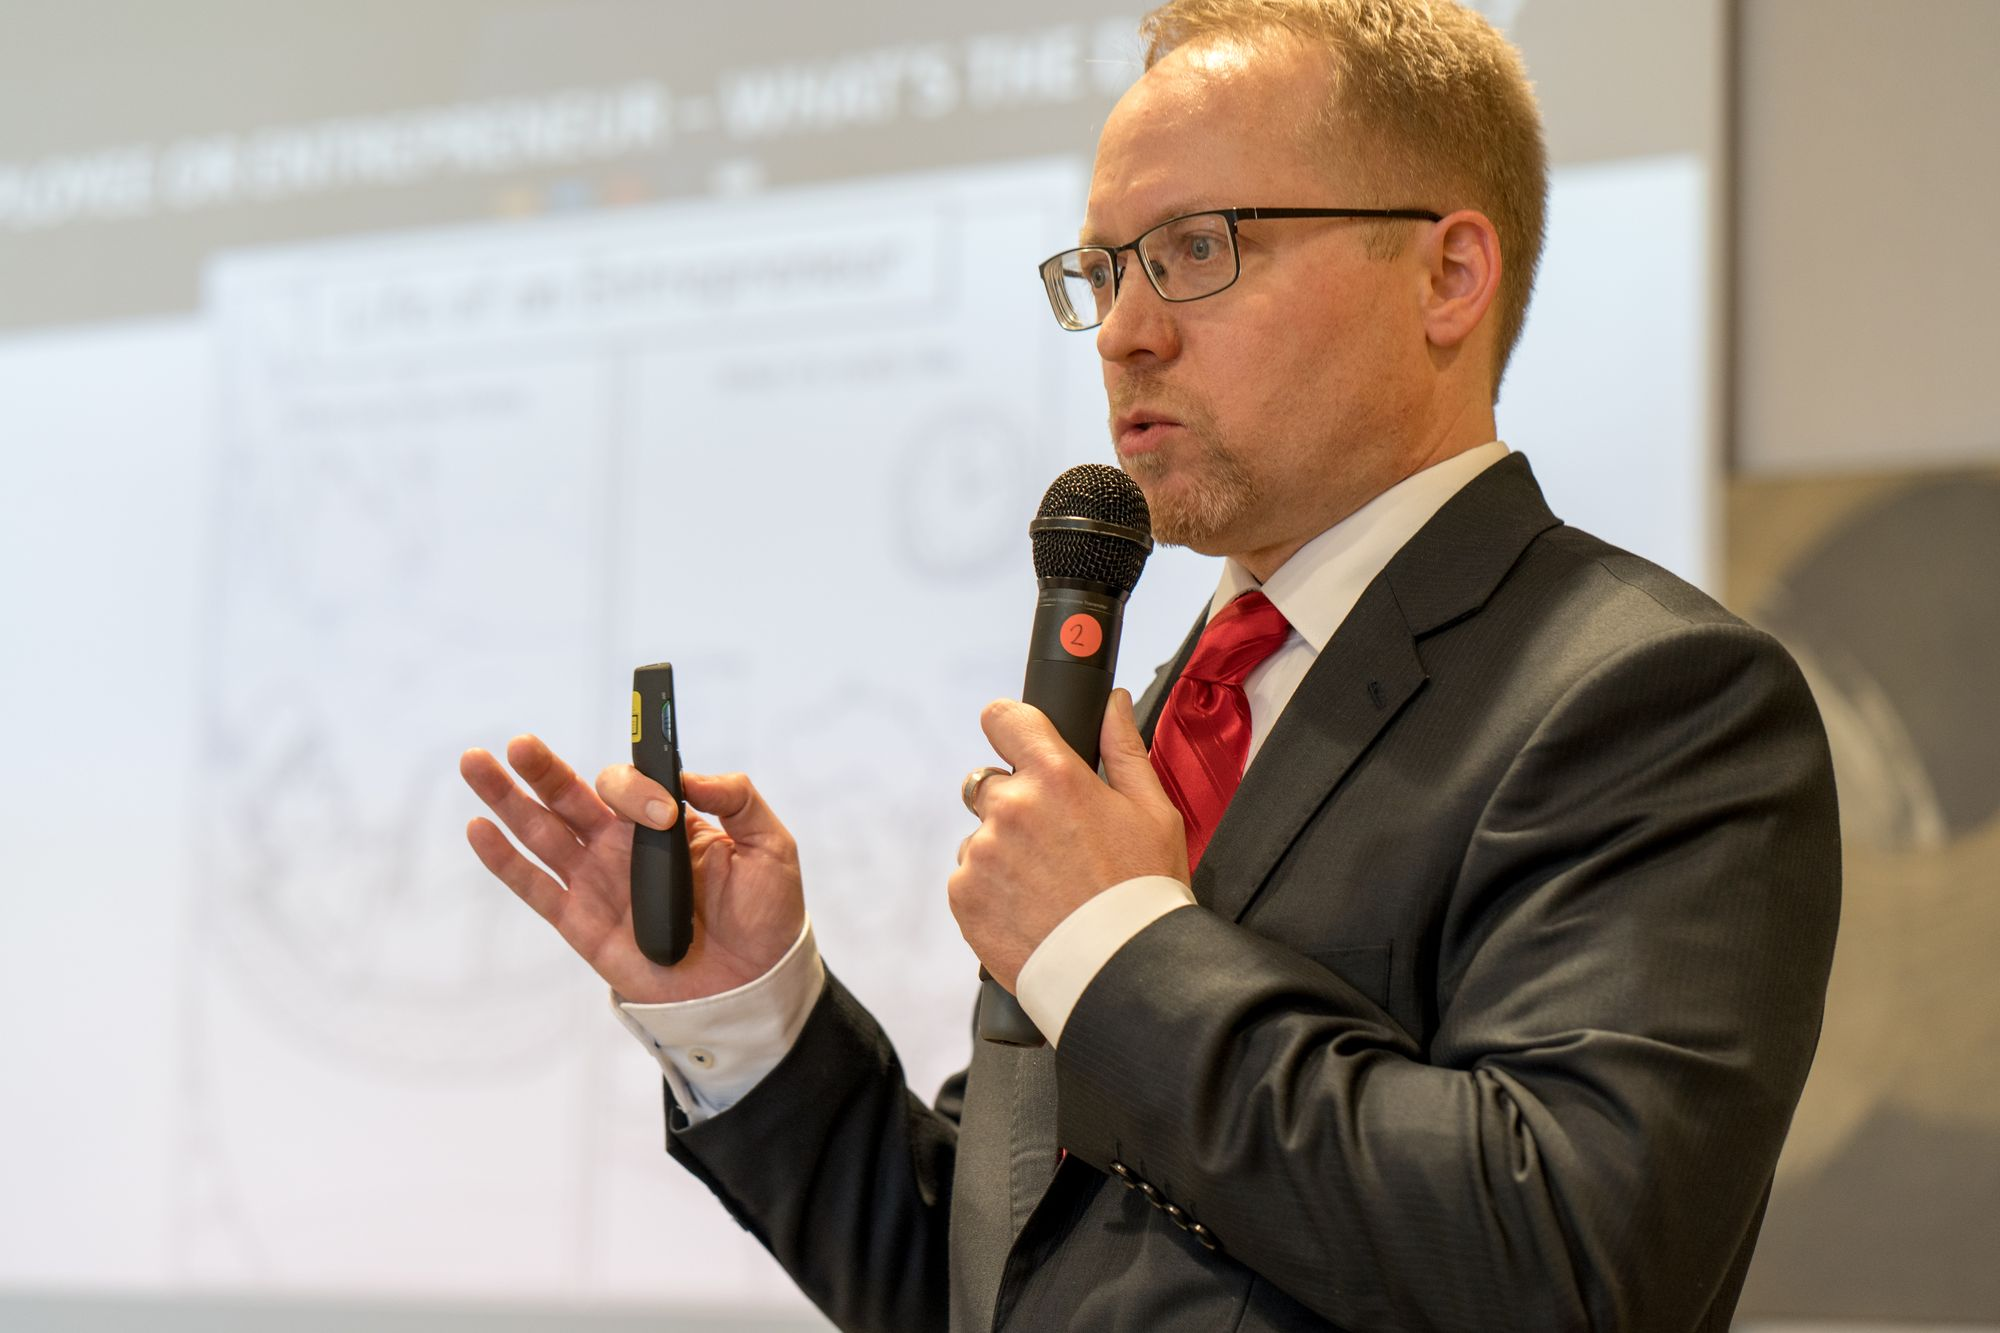 Thomas Loczewski (Tom Loc) als Sprecher auf dem Builderall Everest 2019 in Nürnberg (Germany)